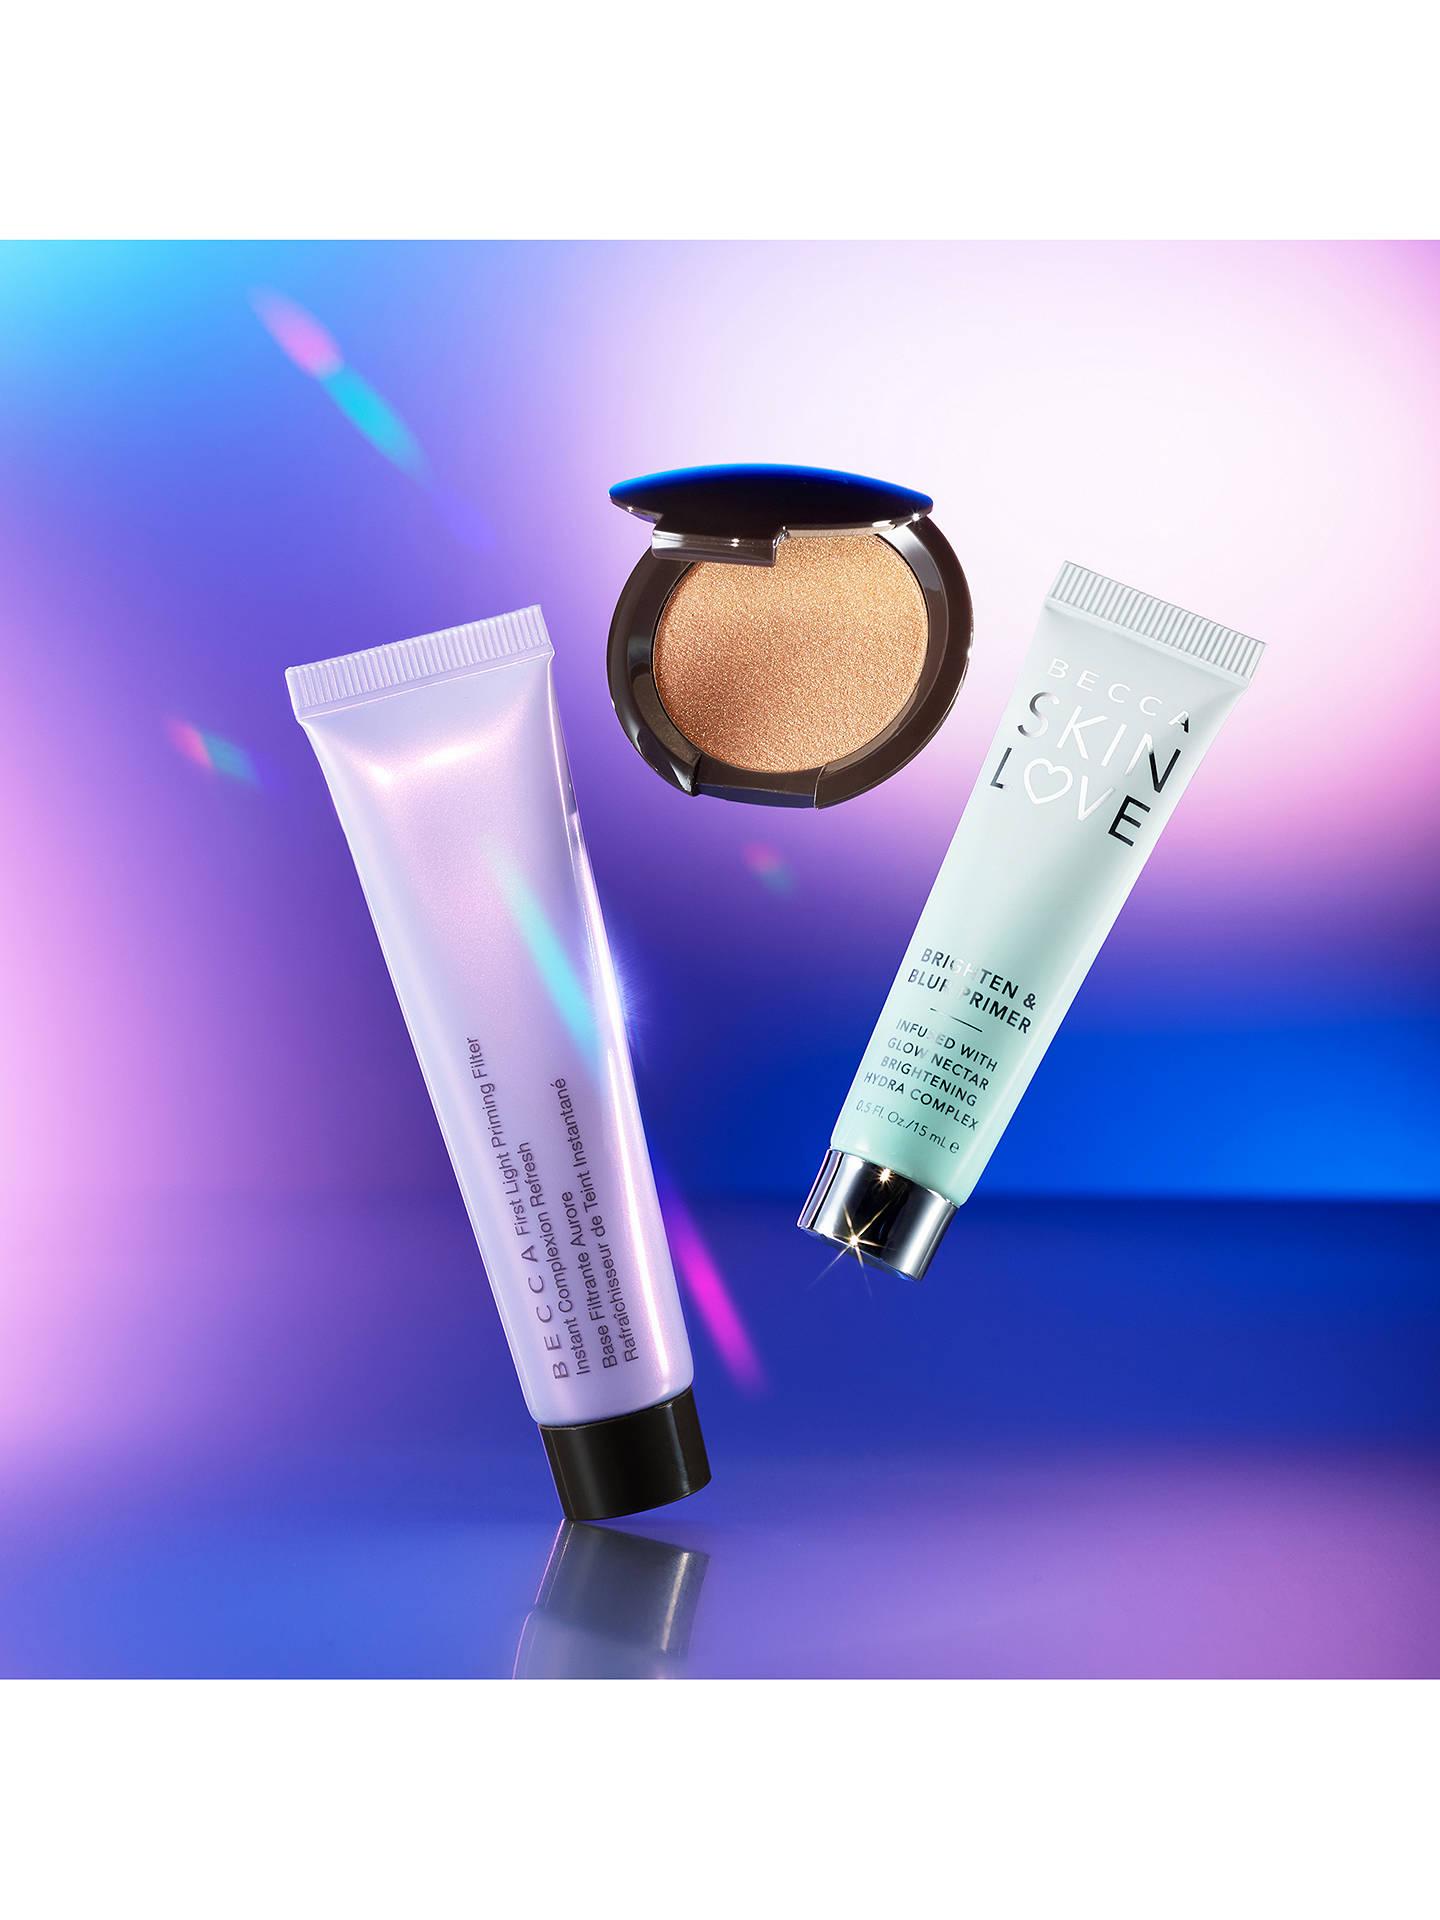 Becca Put A Glow On It Makeup Gift Set